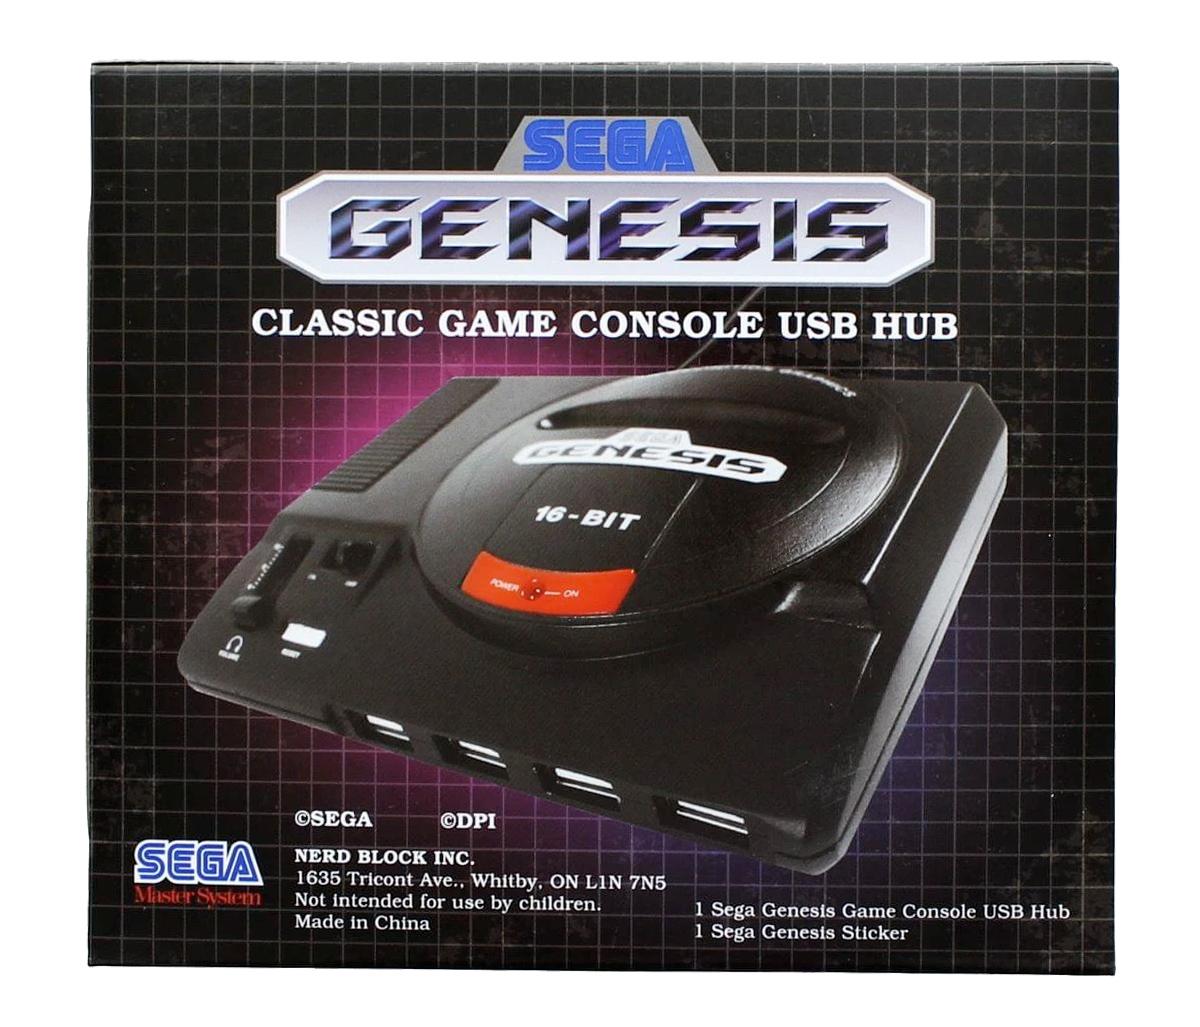 Hub USB Sega Genesis Classic Game Console